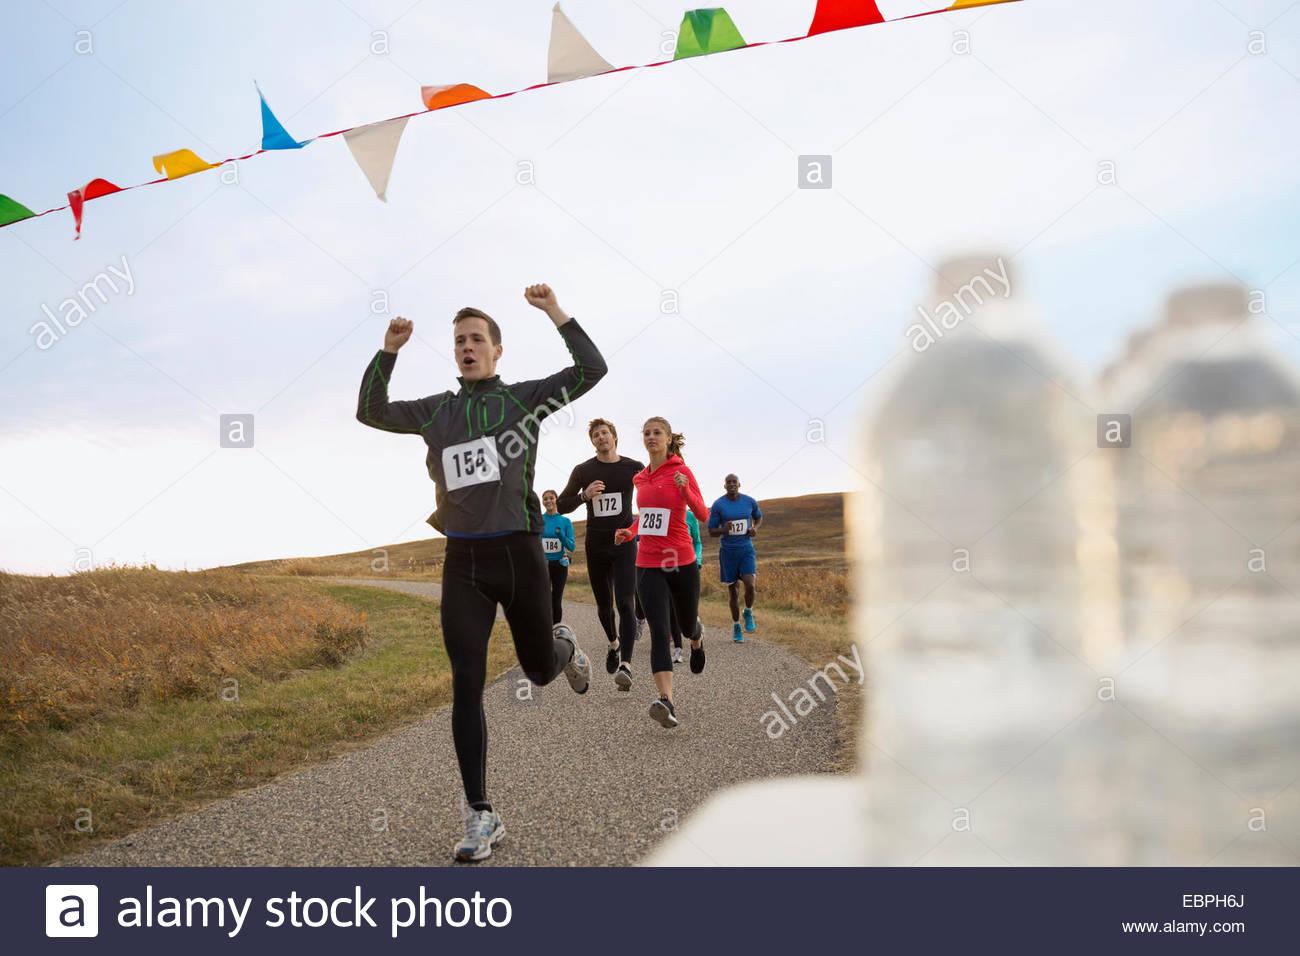 Deslizadera vítores acercándose finish line Imagen De Stock